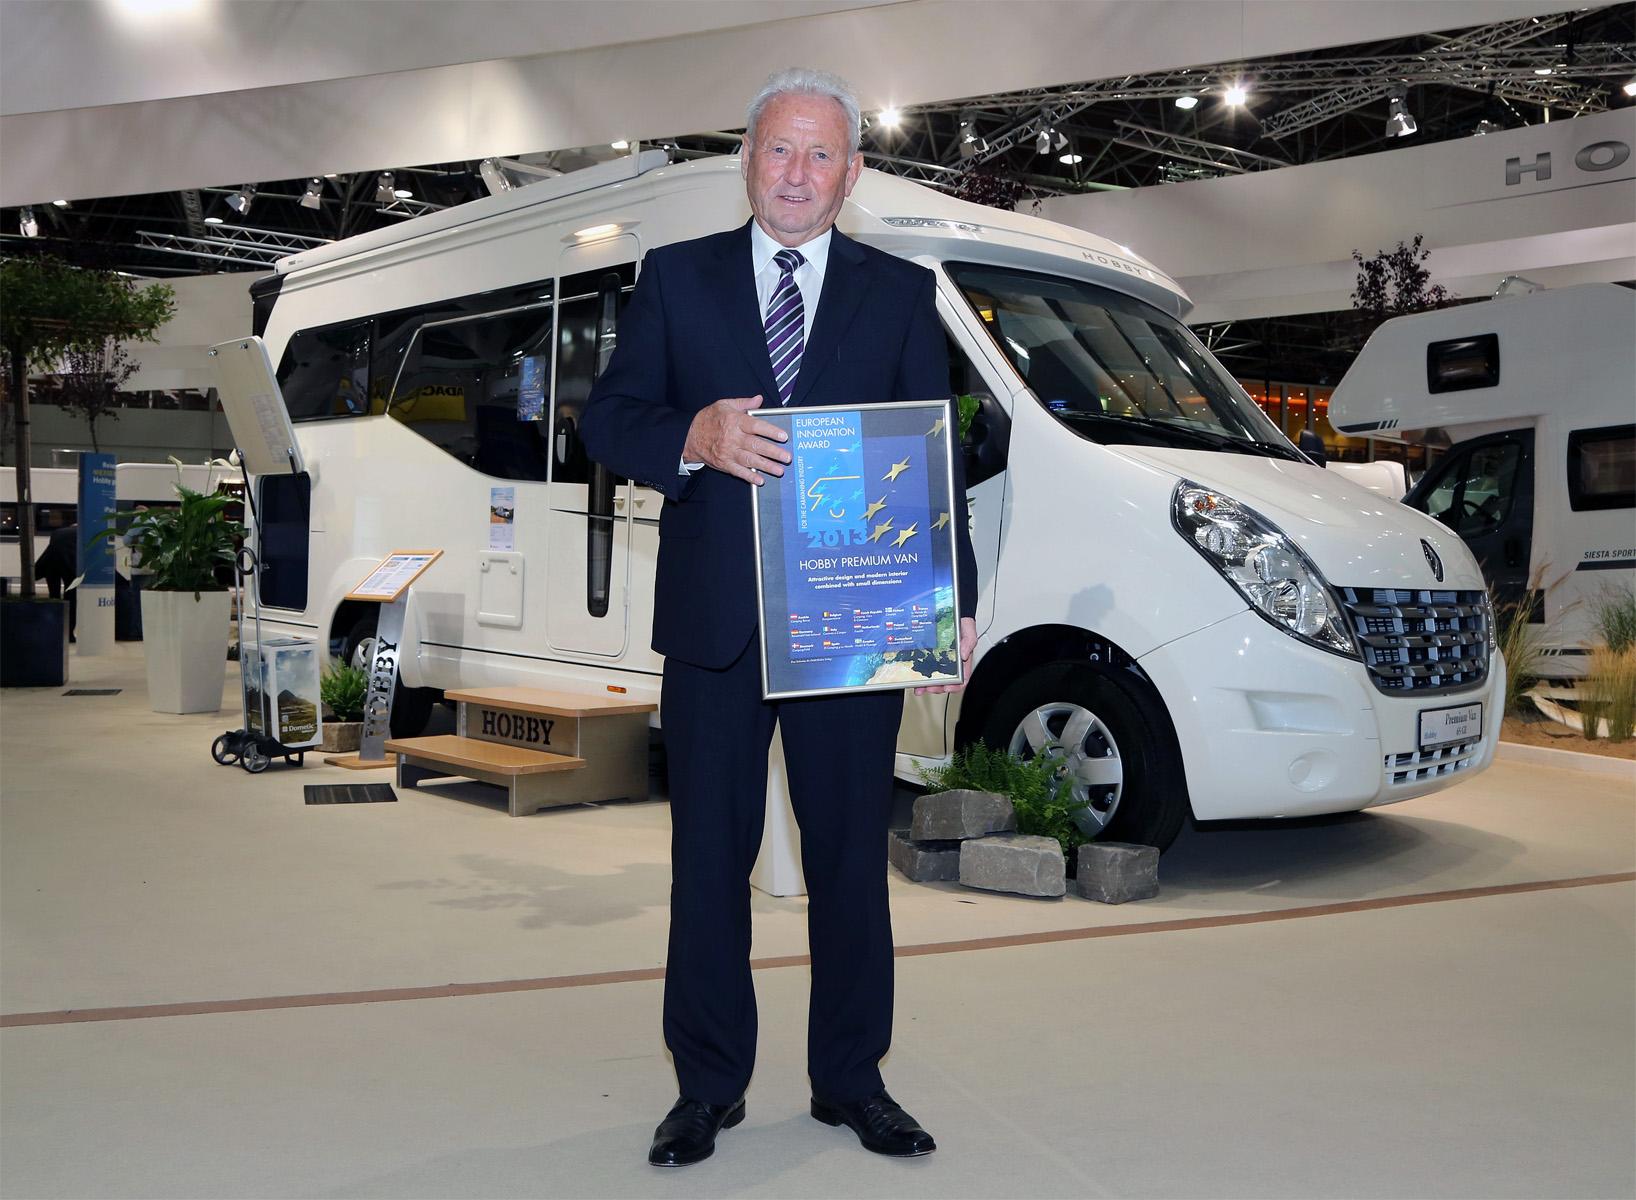 EIA_Hobby_Premium_Van